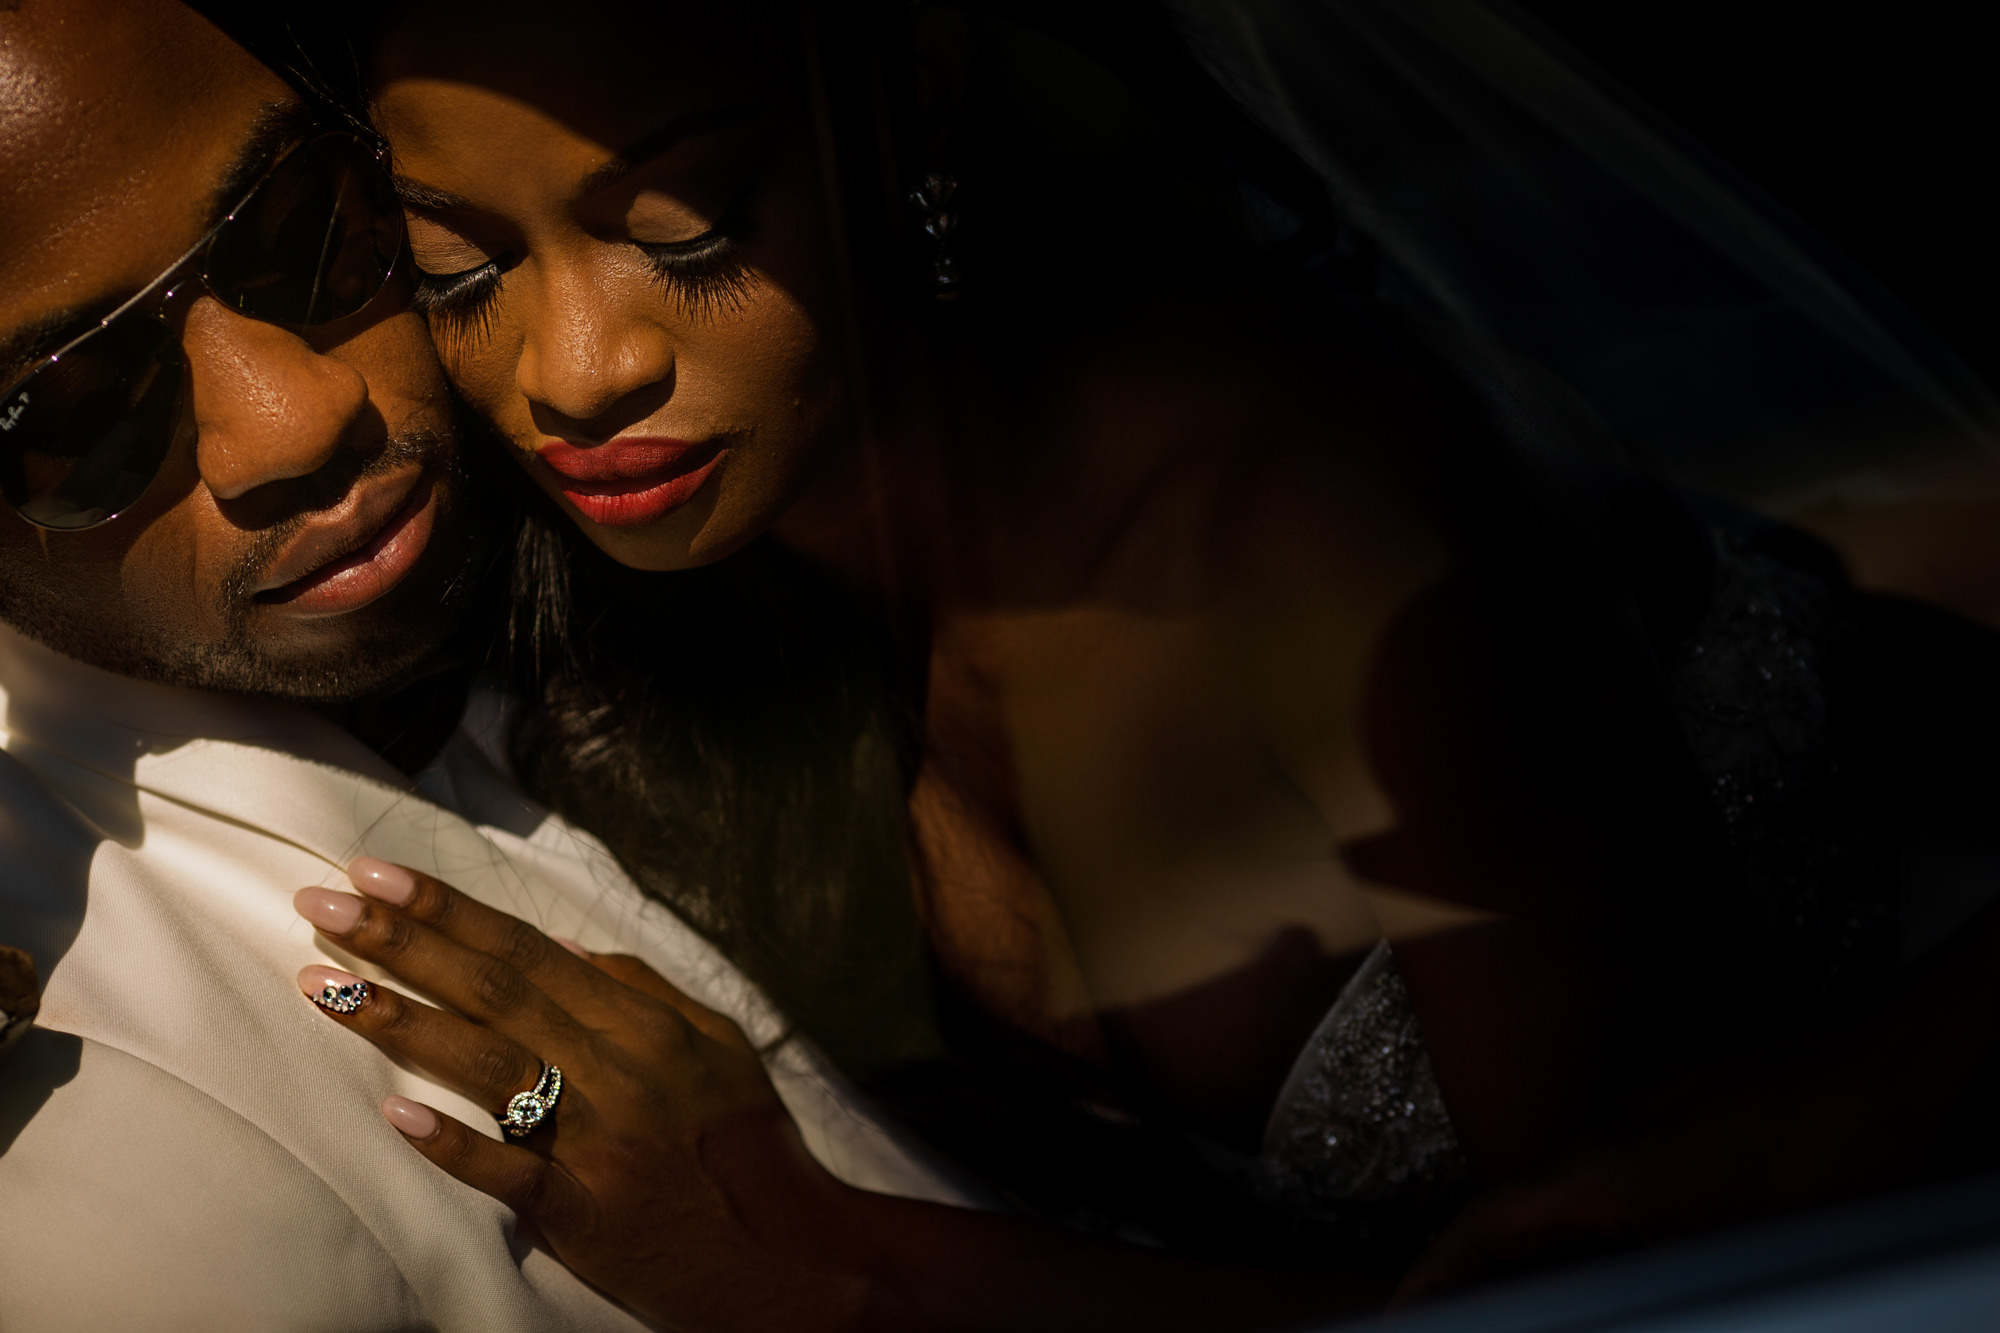 portrait-black-couple-red-lips-long-lashes-diamond-nails-worlds-best-wedding-photos-jide-alakija-new-york-wedding-photographers